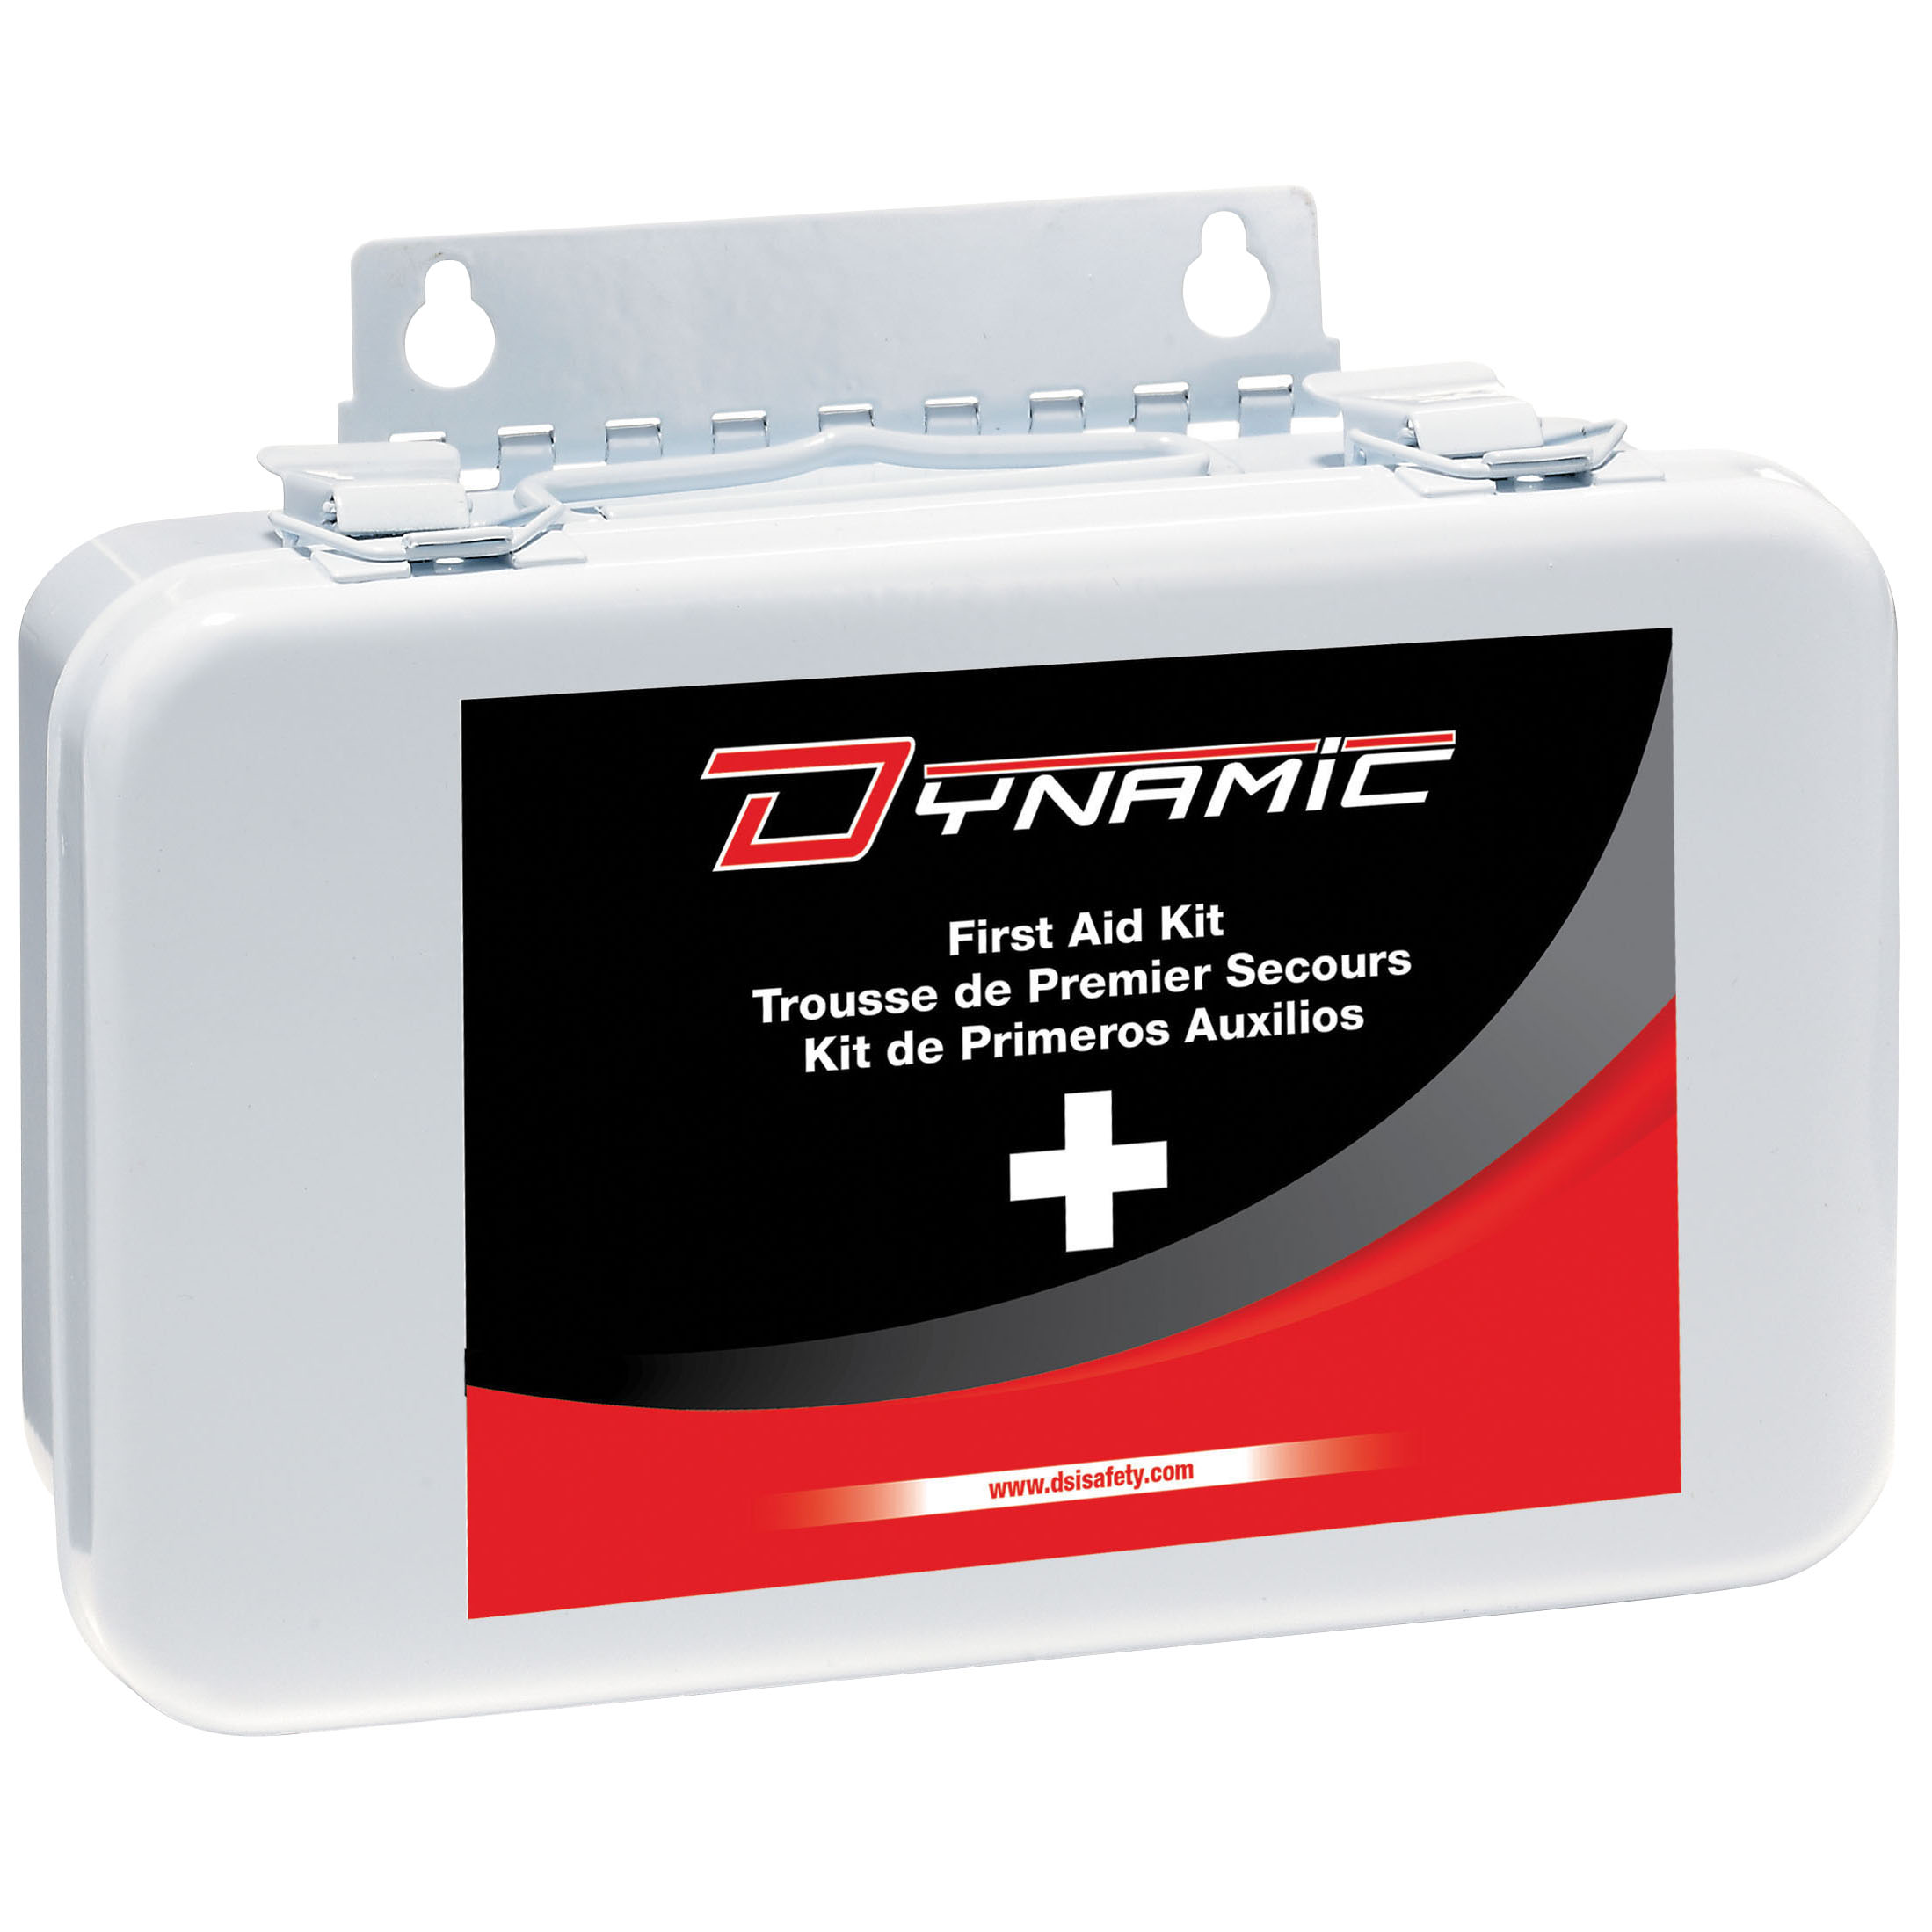 CSA standard First aid kit Type 1 in metal box